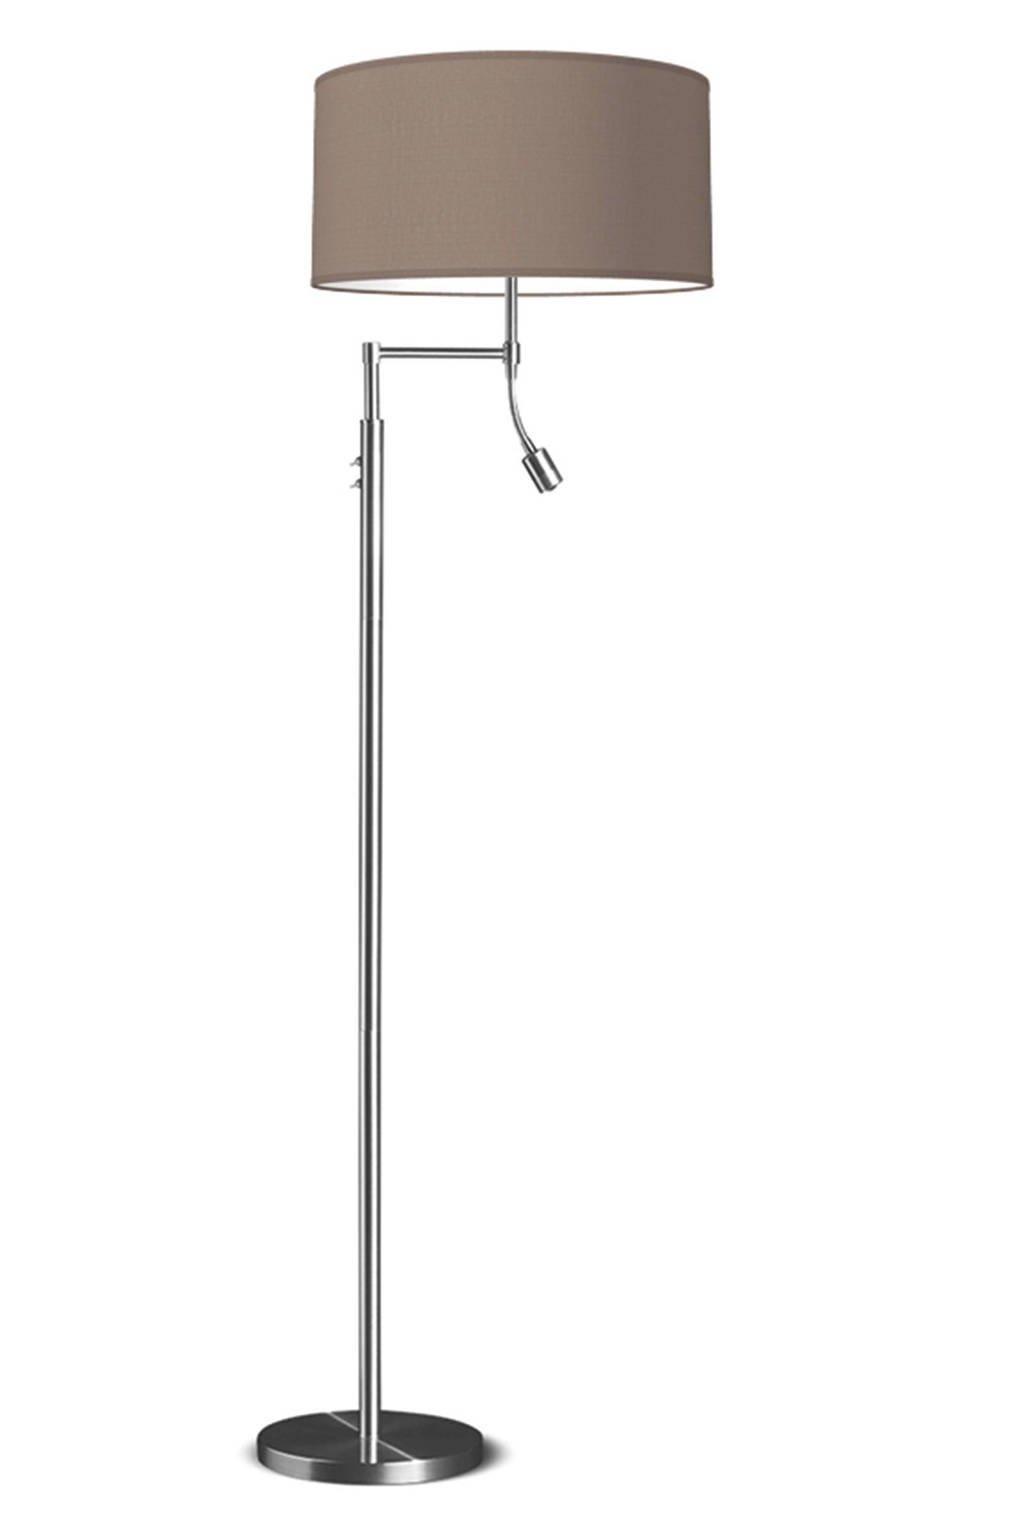 home sweet home vloerlamp (met gratis LED lamp), Taupe/zilver